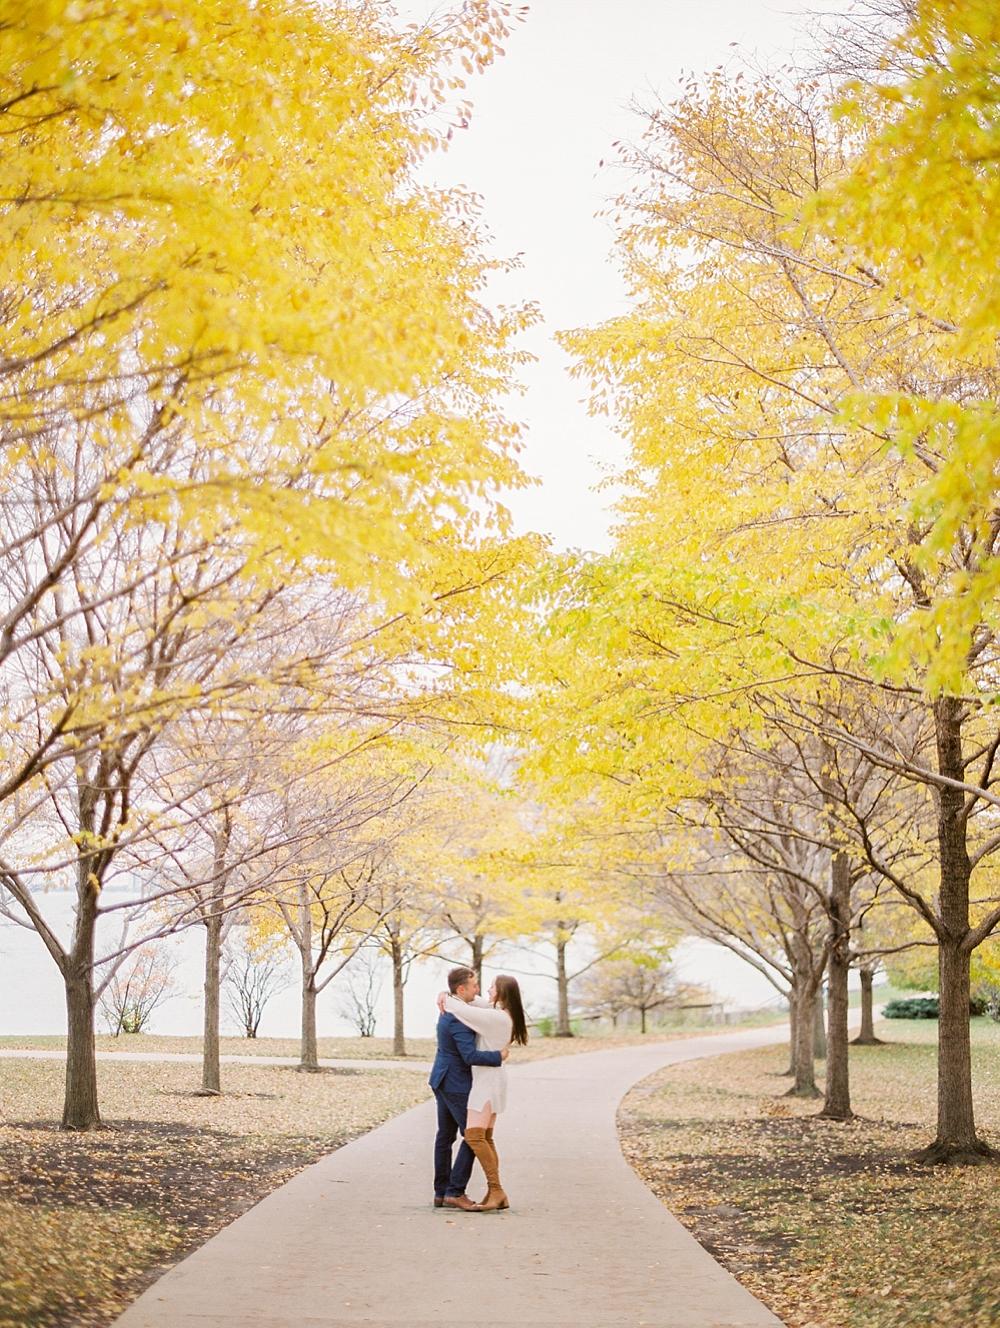 kristin-la-voie-photography-chicago-Wedding-Photographer-museum-campus-adler-planetarium-engagement-20